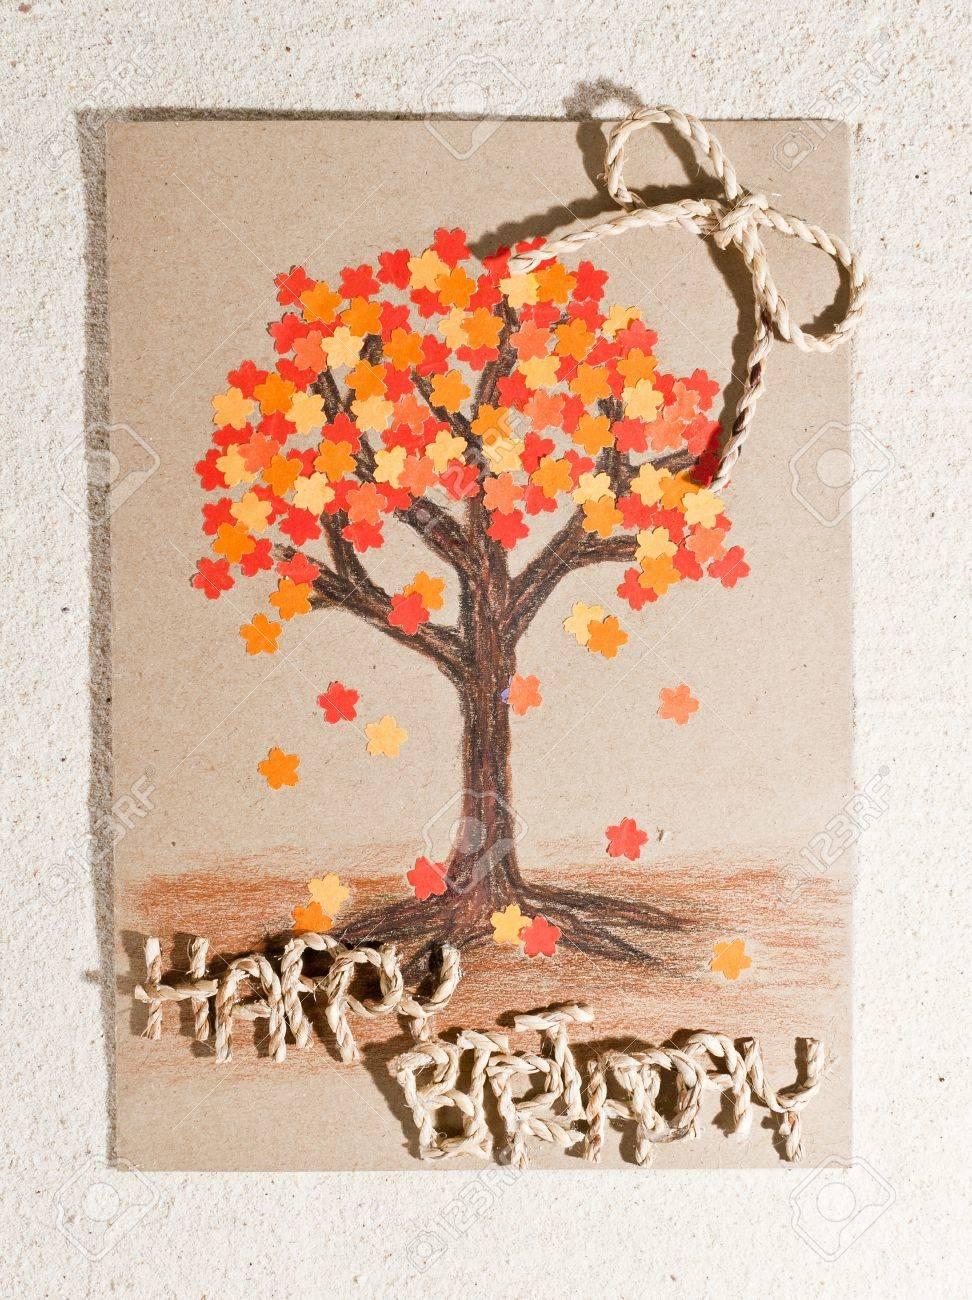 Handmade Happy Birthday Card Isolated On Sand Background – Handmade Happy Birthday Cards